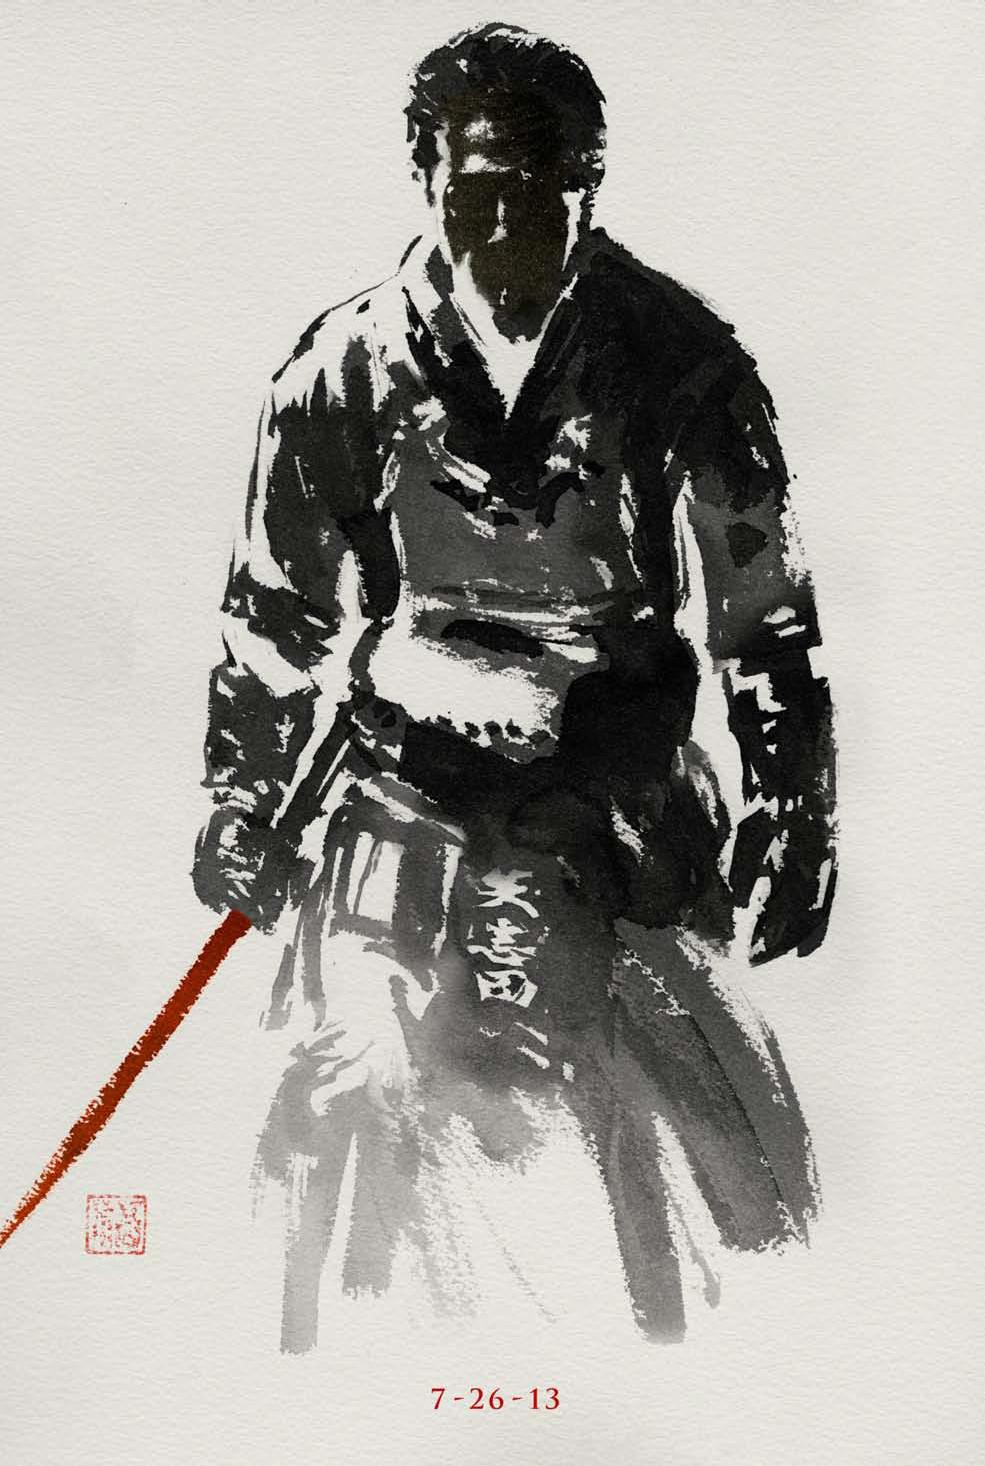 shingen-poster-wolverine-film